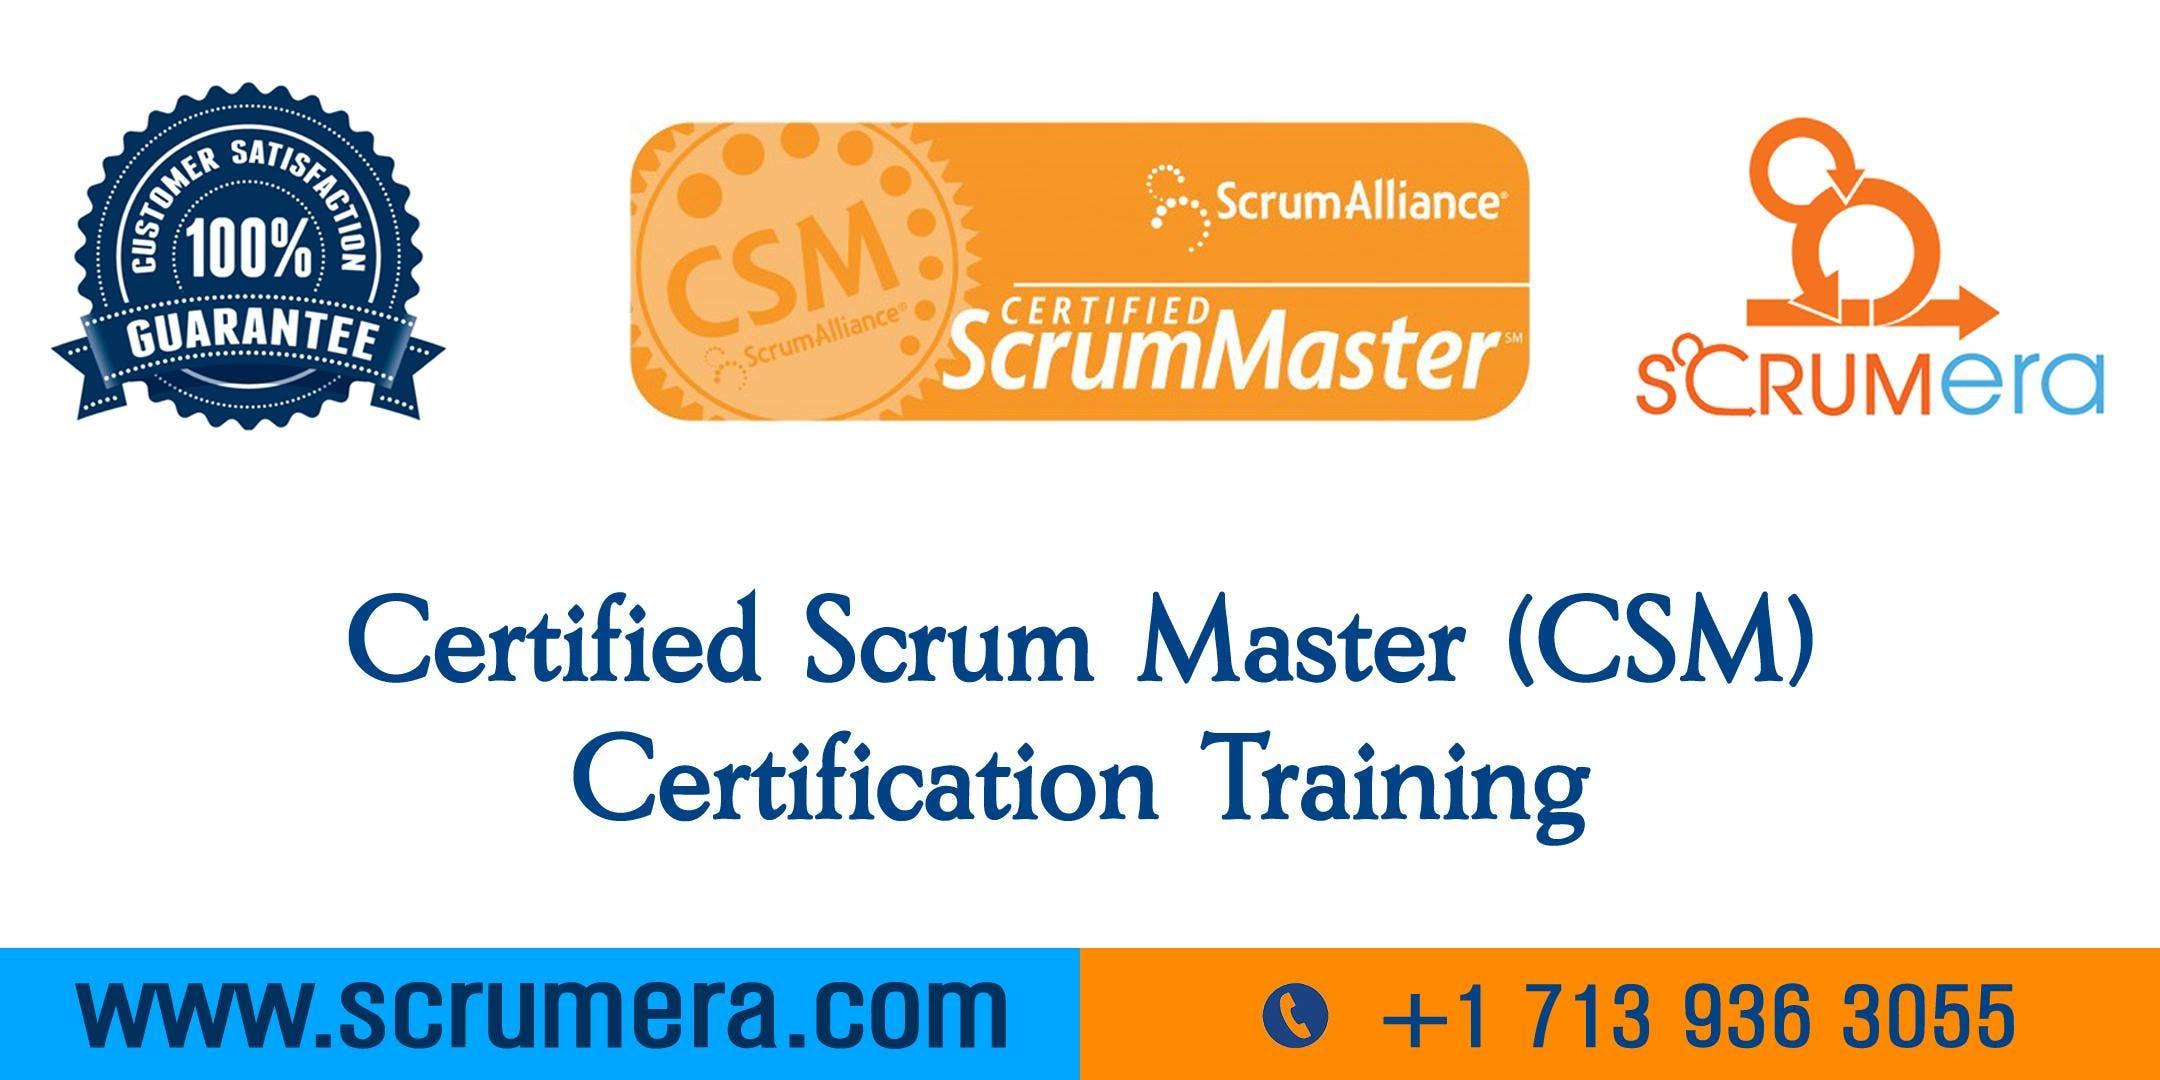 Scrum Master Certification | CSM Training | CSM Certification Workshop | Certified Scrum Master (CSM) Training in Glendale, CA | ScrumERA